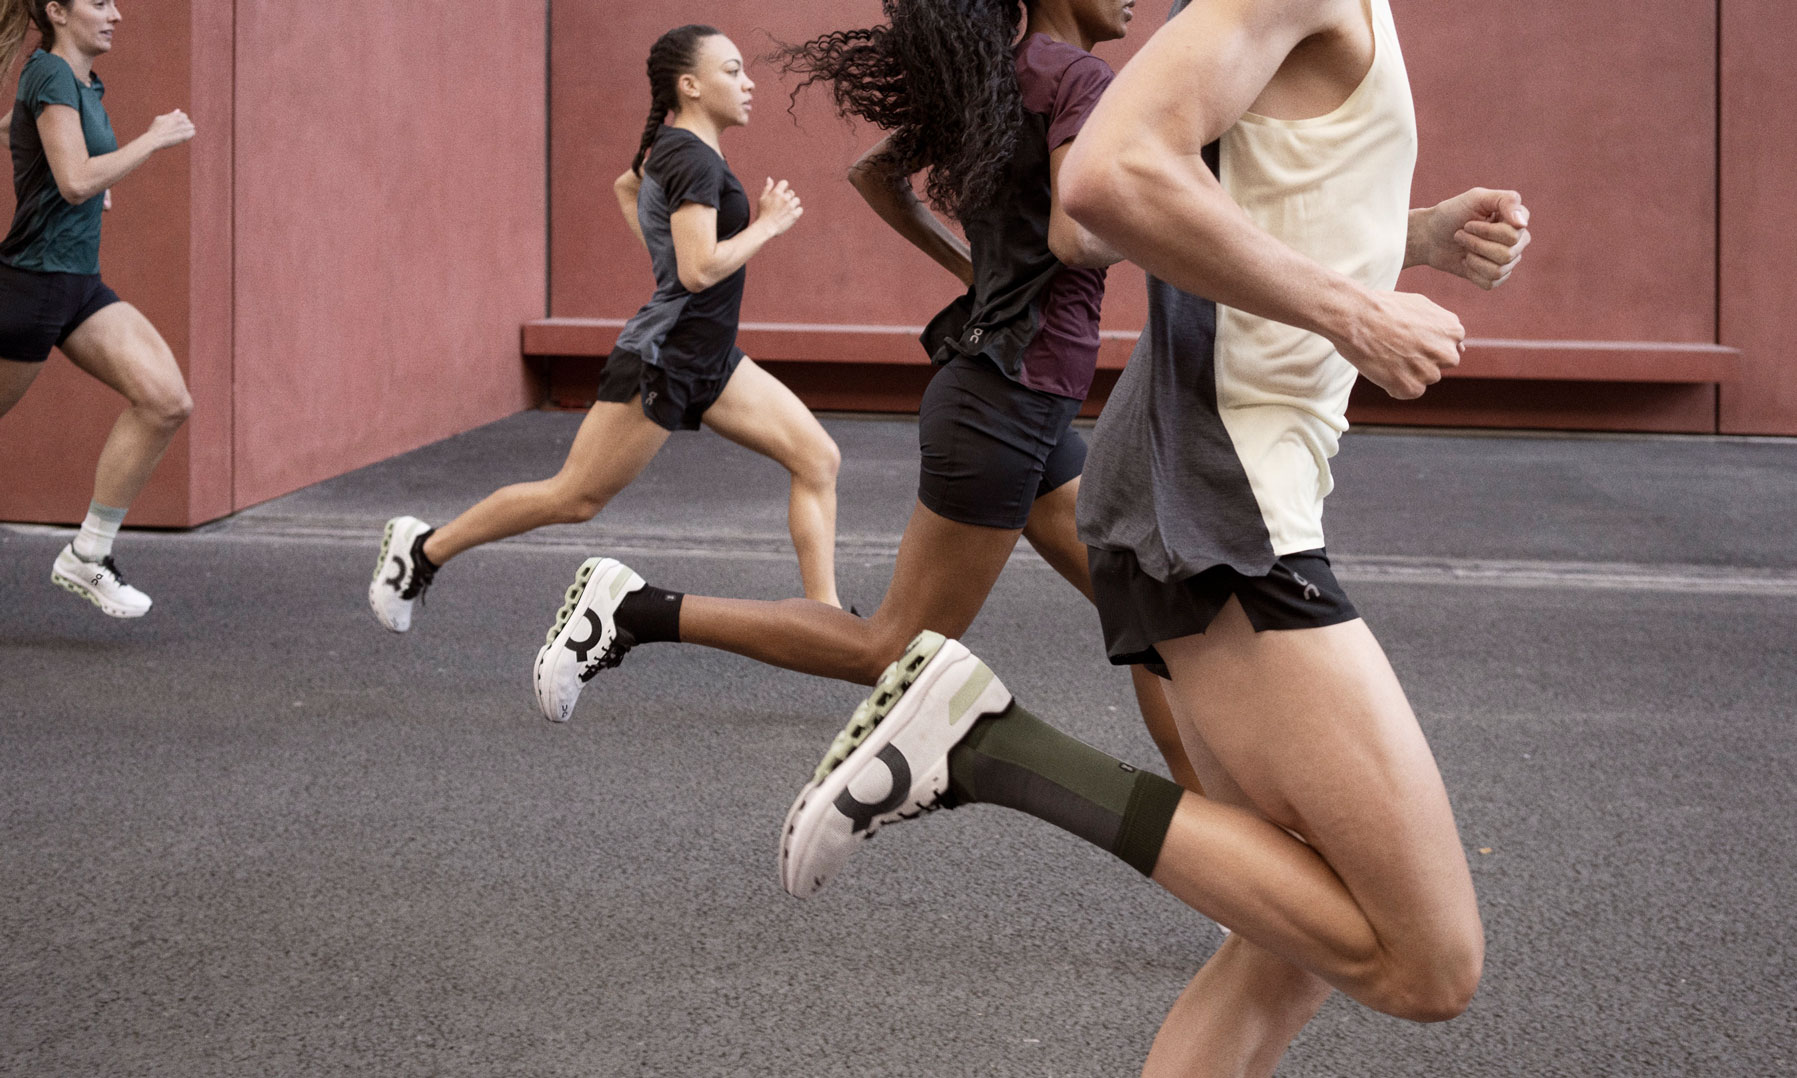 On 昂跑推出出全新精英马拉松竞速跑鞋 Cloudboom Echo